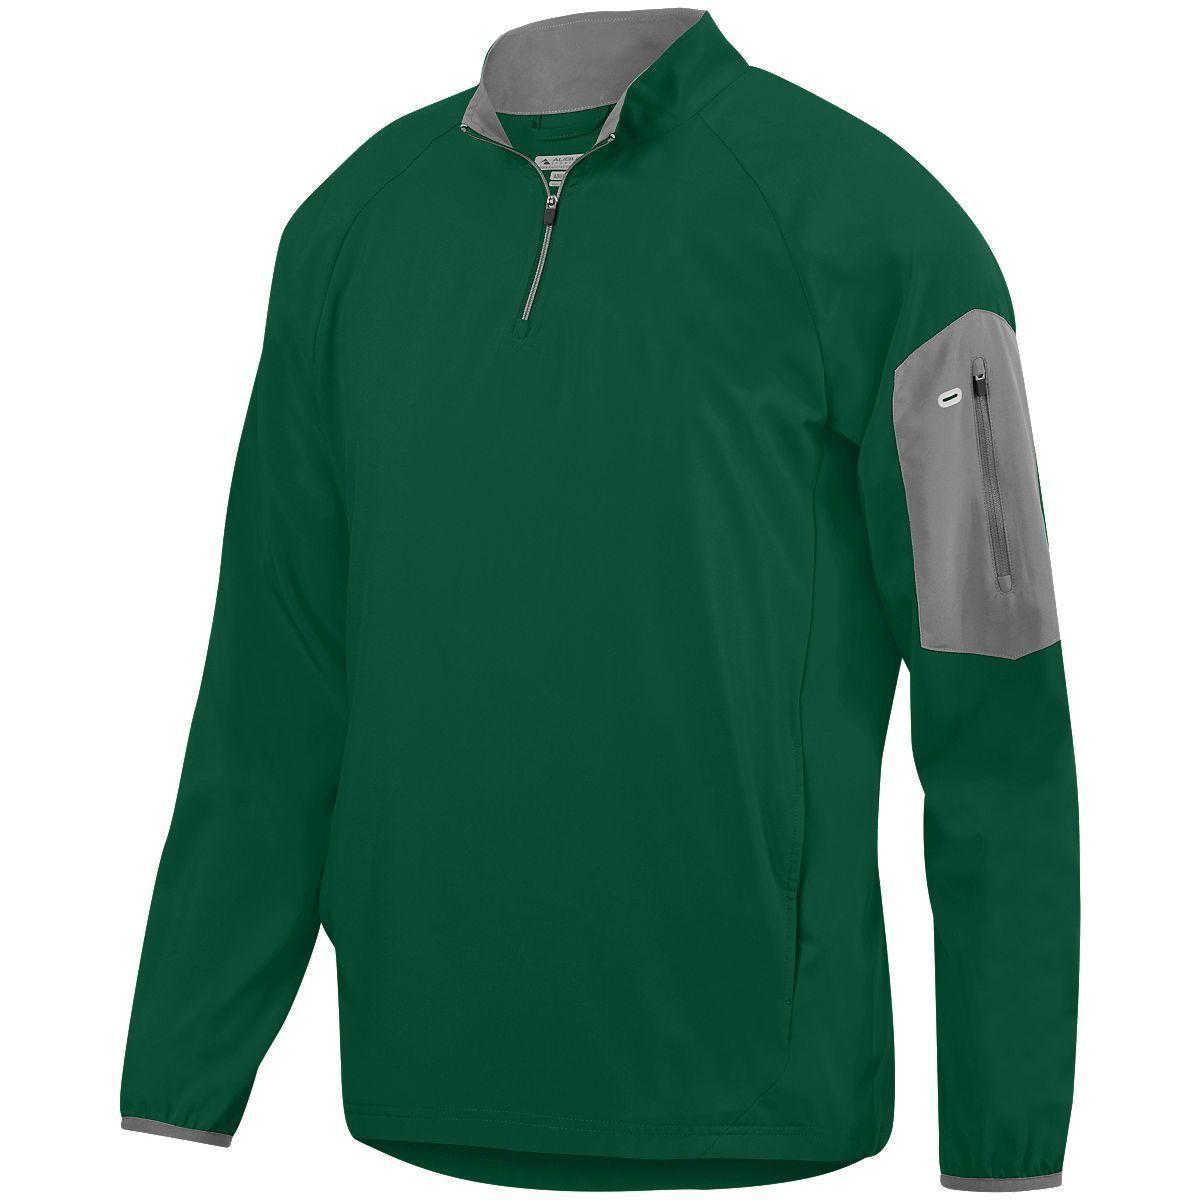 Preeminent Half-Zip Pullover - DARK GREEN/GRAPHITE